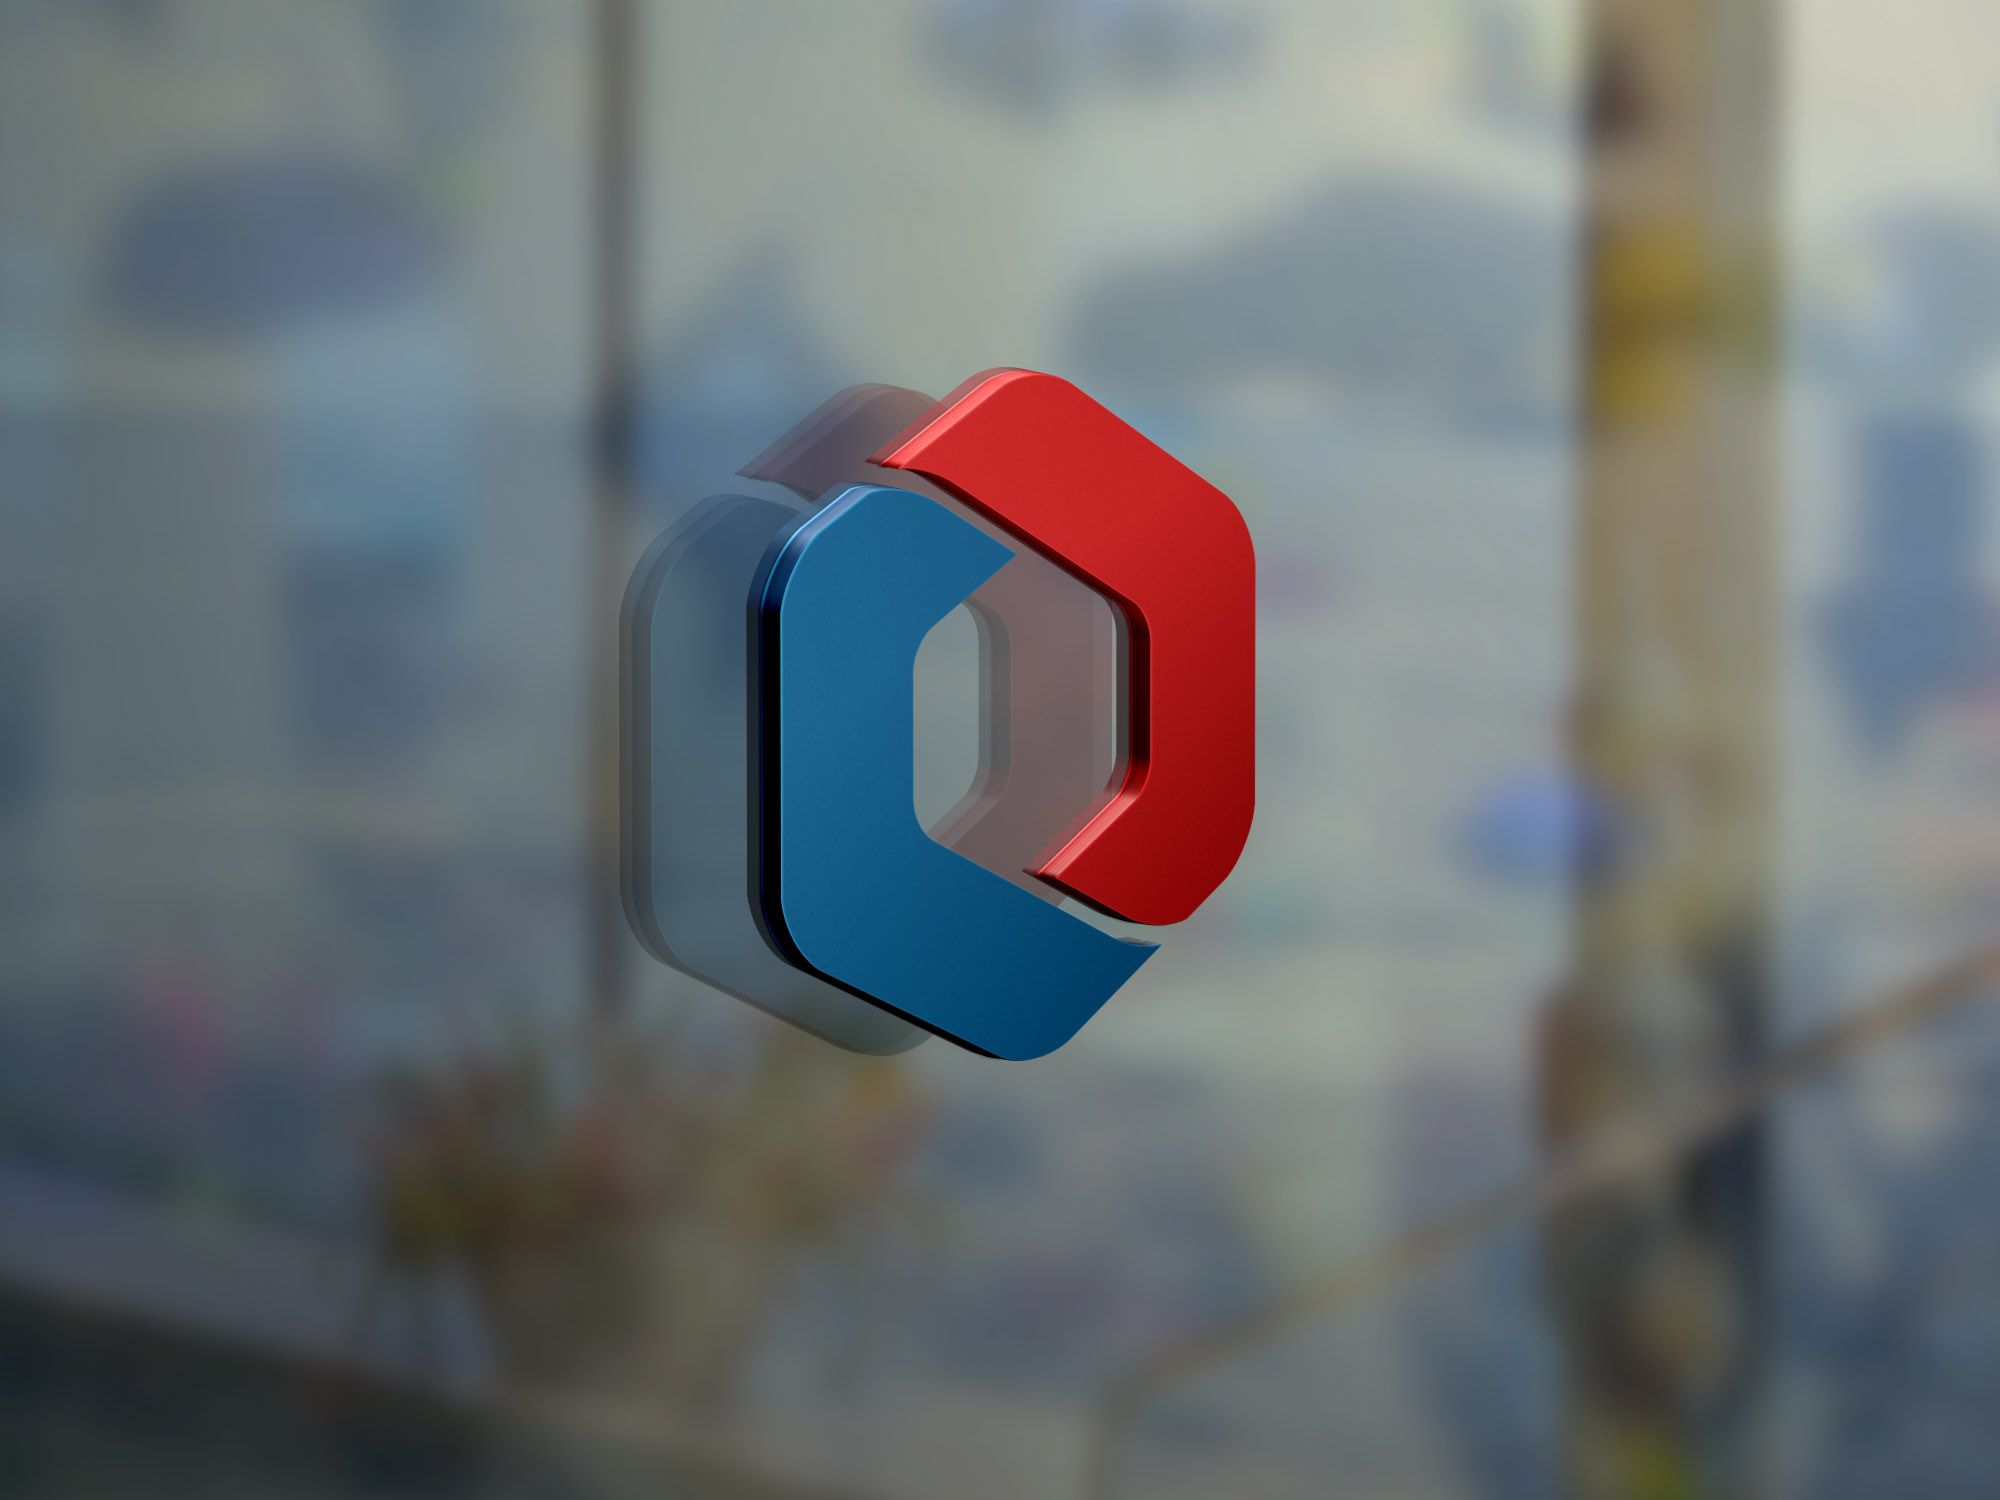 opg-logo-mock-up-window